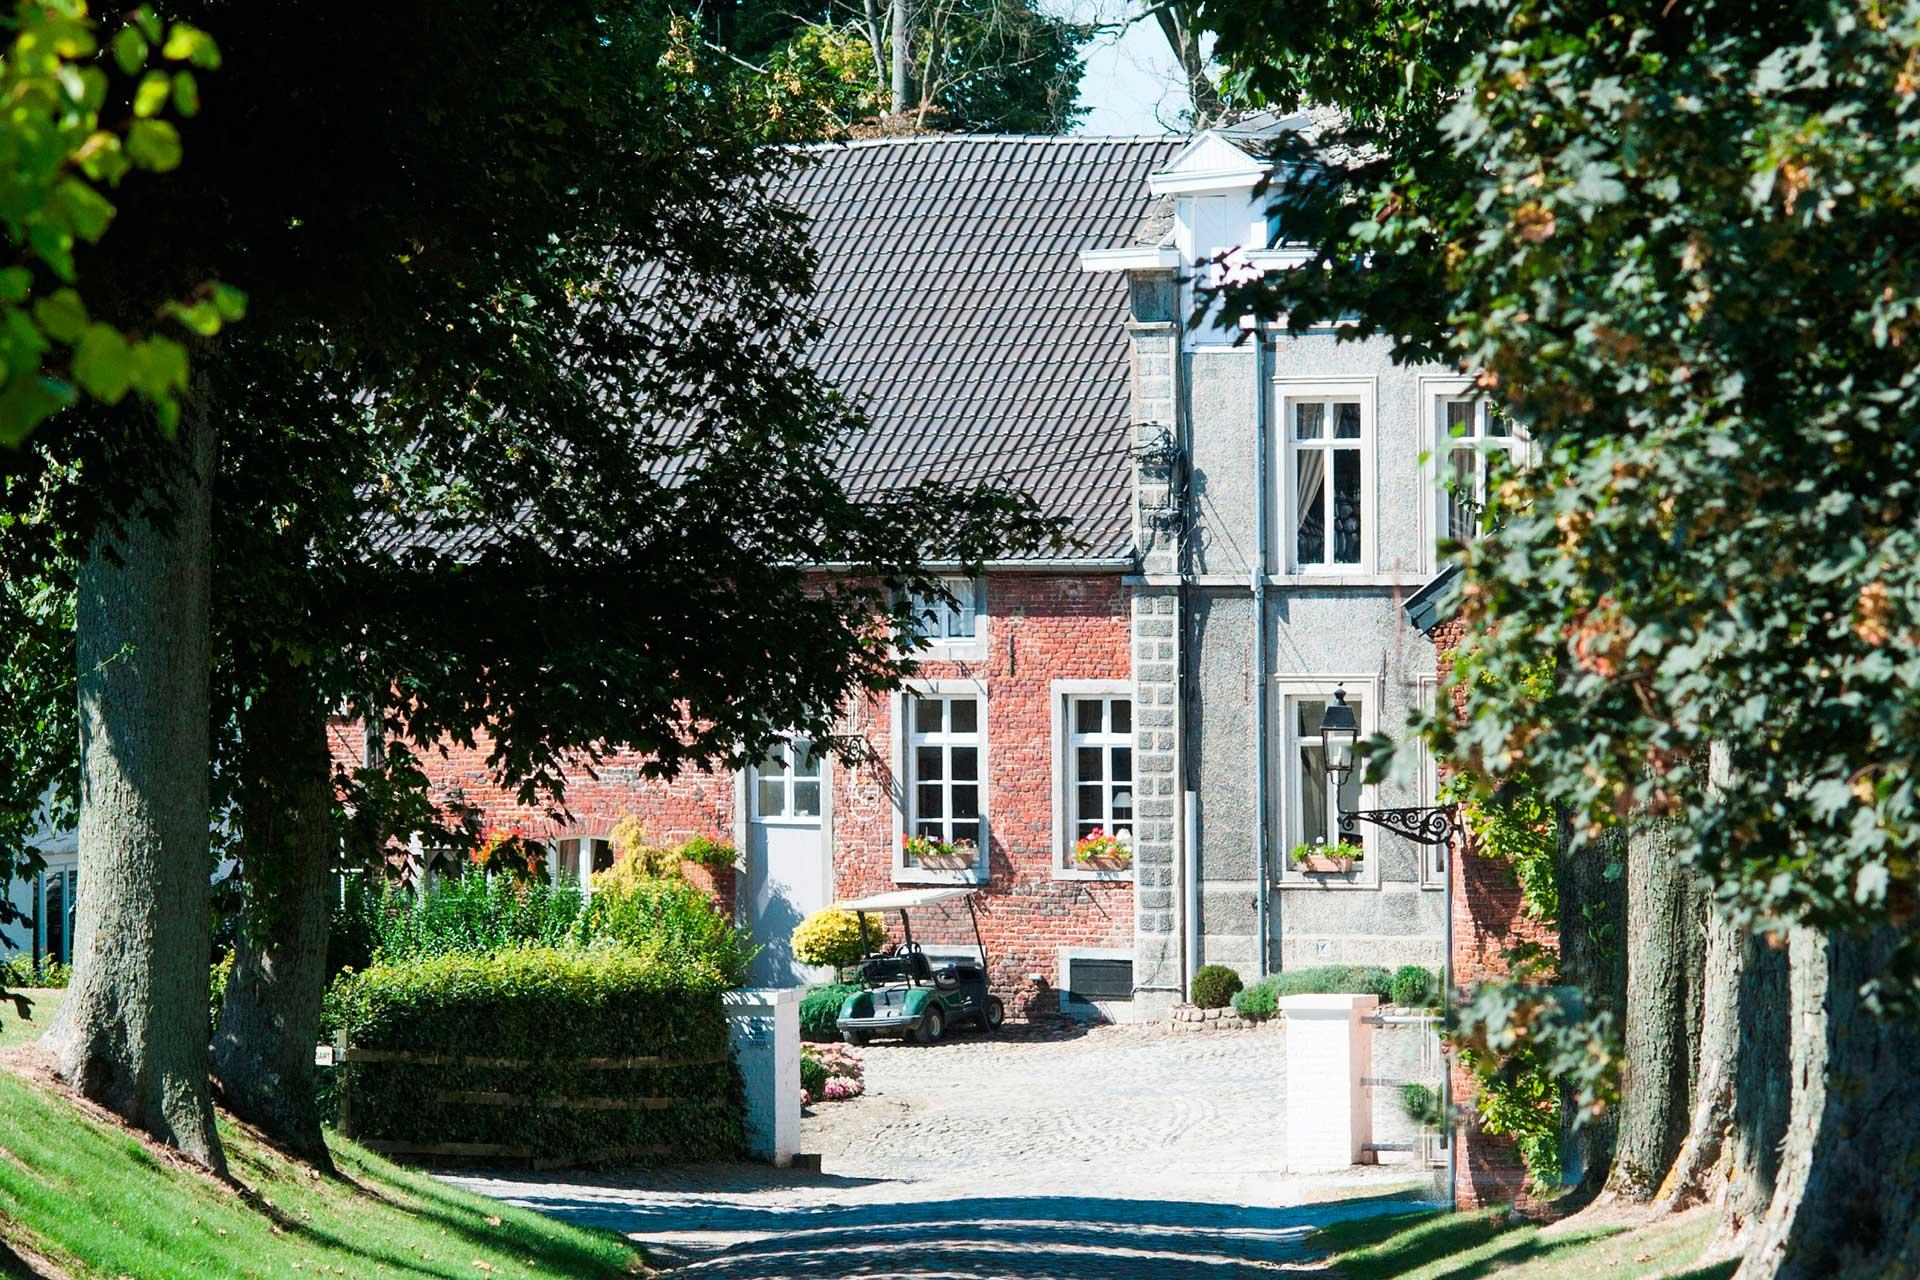 Golfexpedition-Golfreizen-België-Brussel-Pierpont-entrance-road